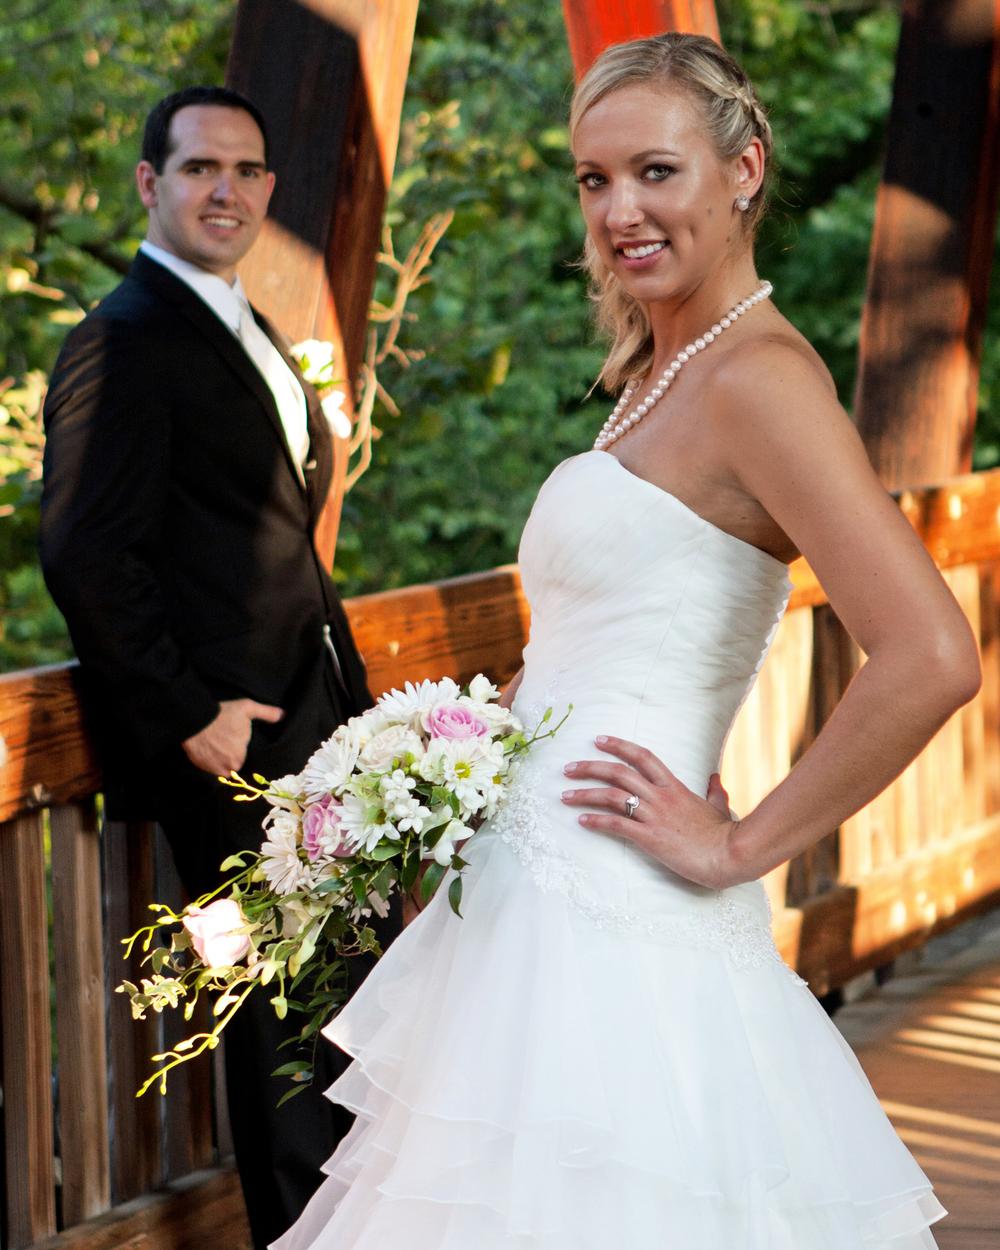 Jenna and Ryan 8x10-2.jpg